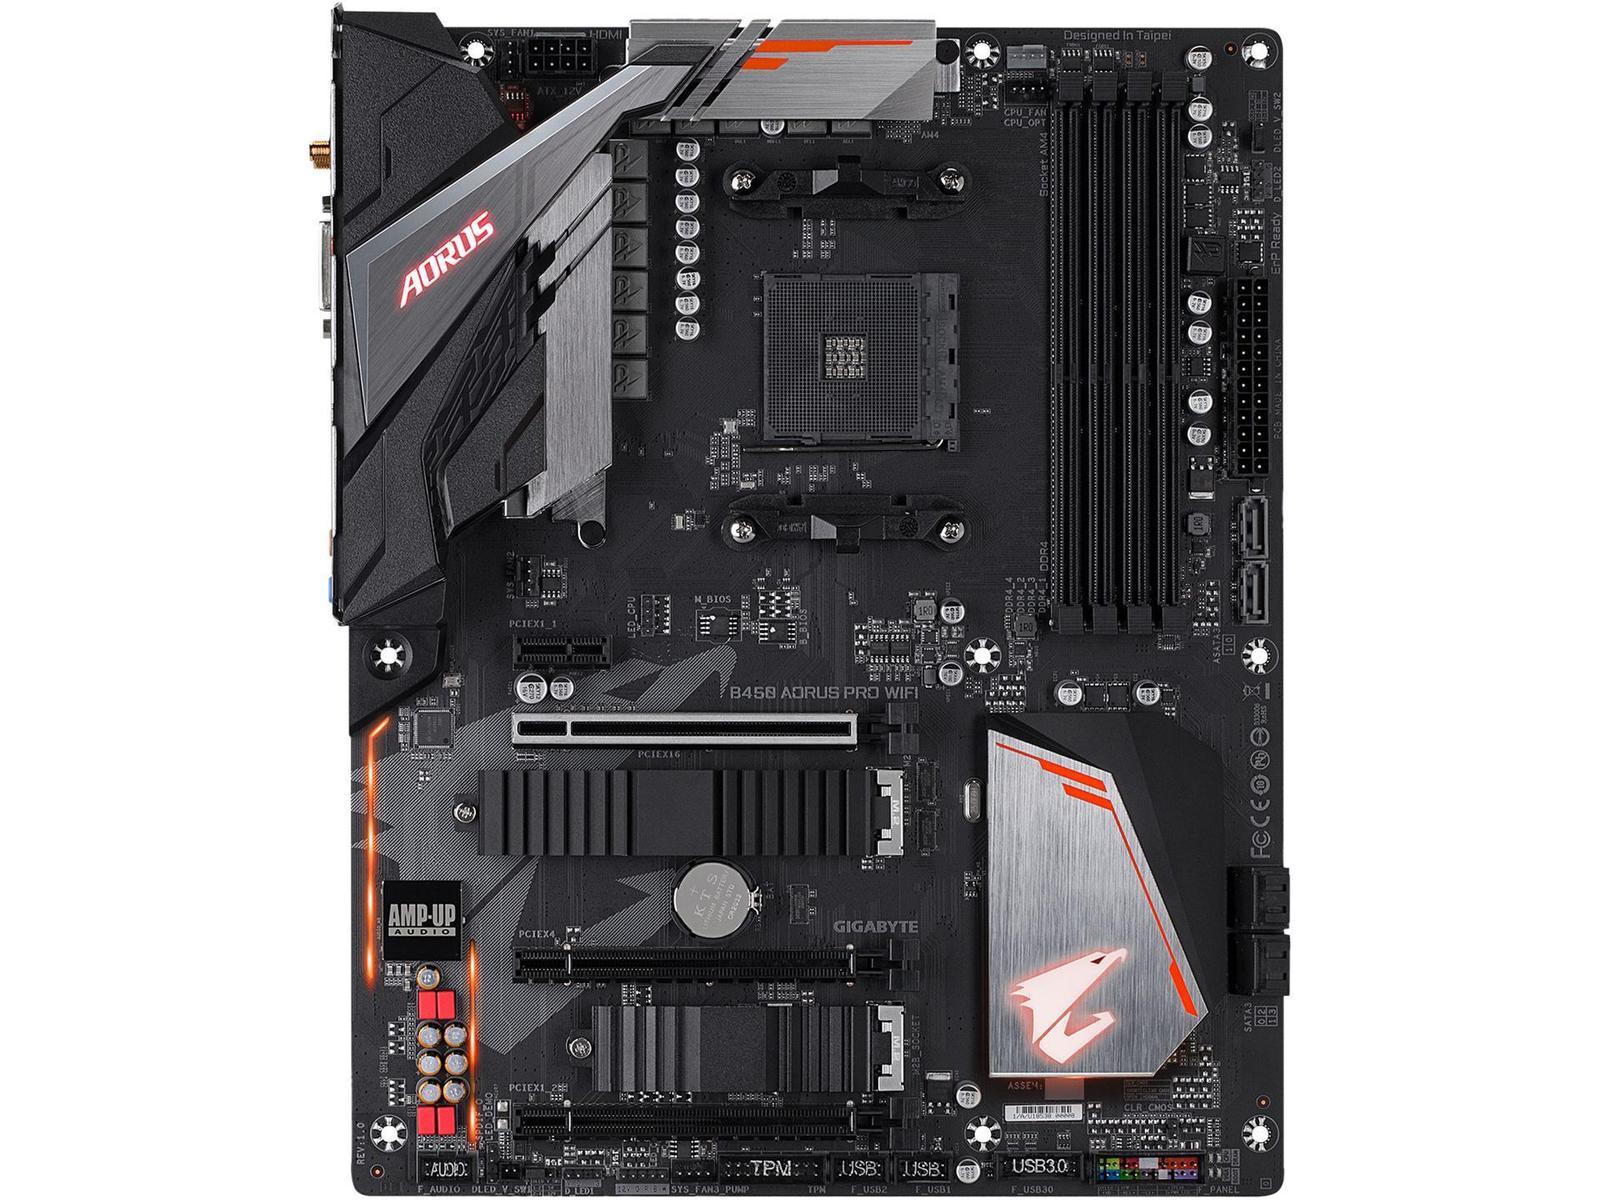 Gigabyte B450 AORUS PRO WIFI (rev. 1.0) ATX AM4 Motherboard